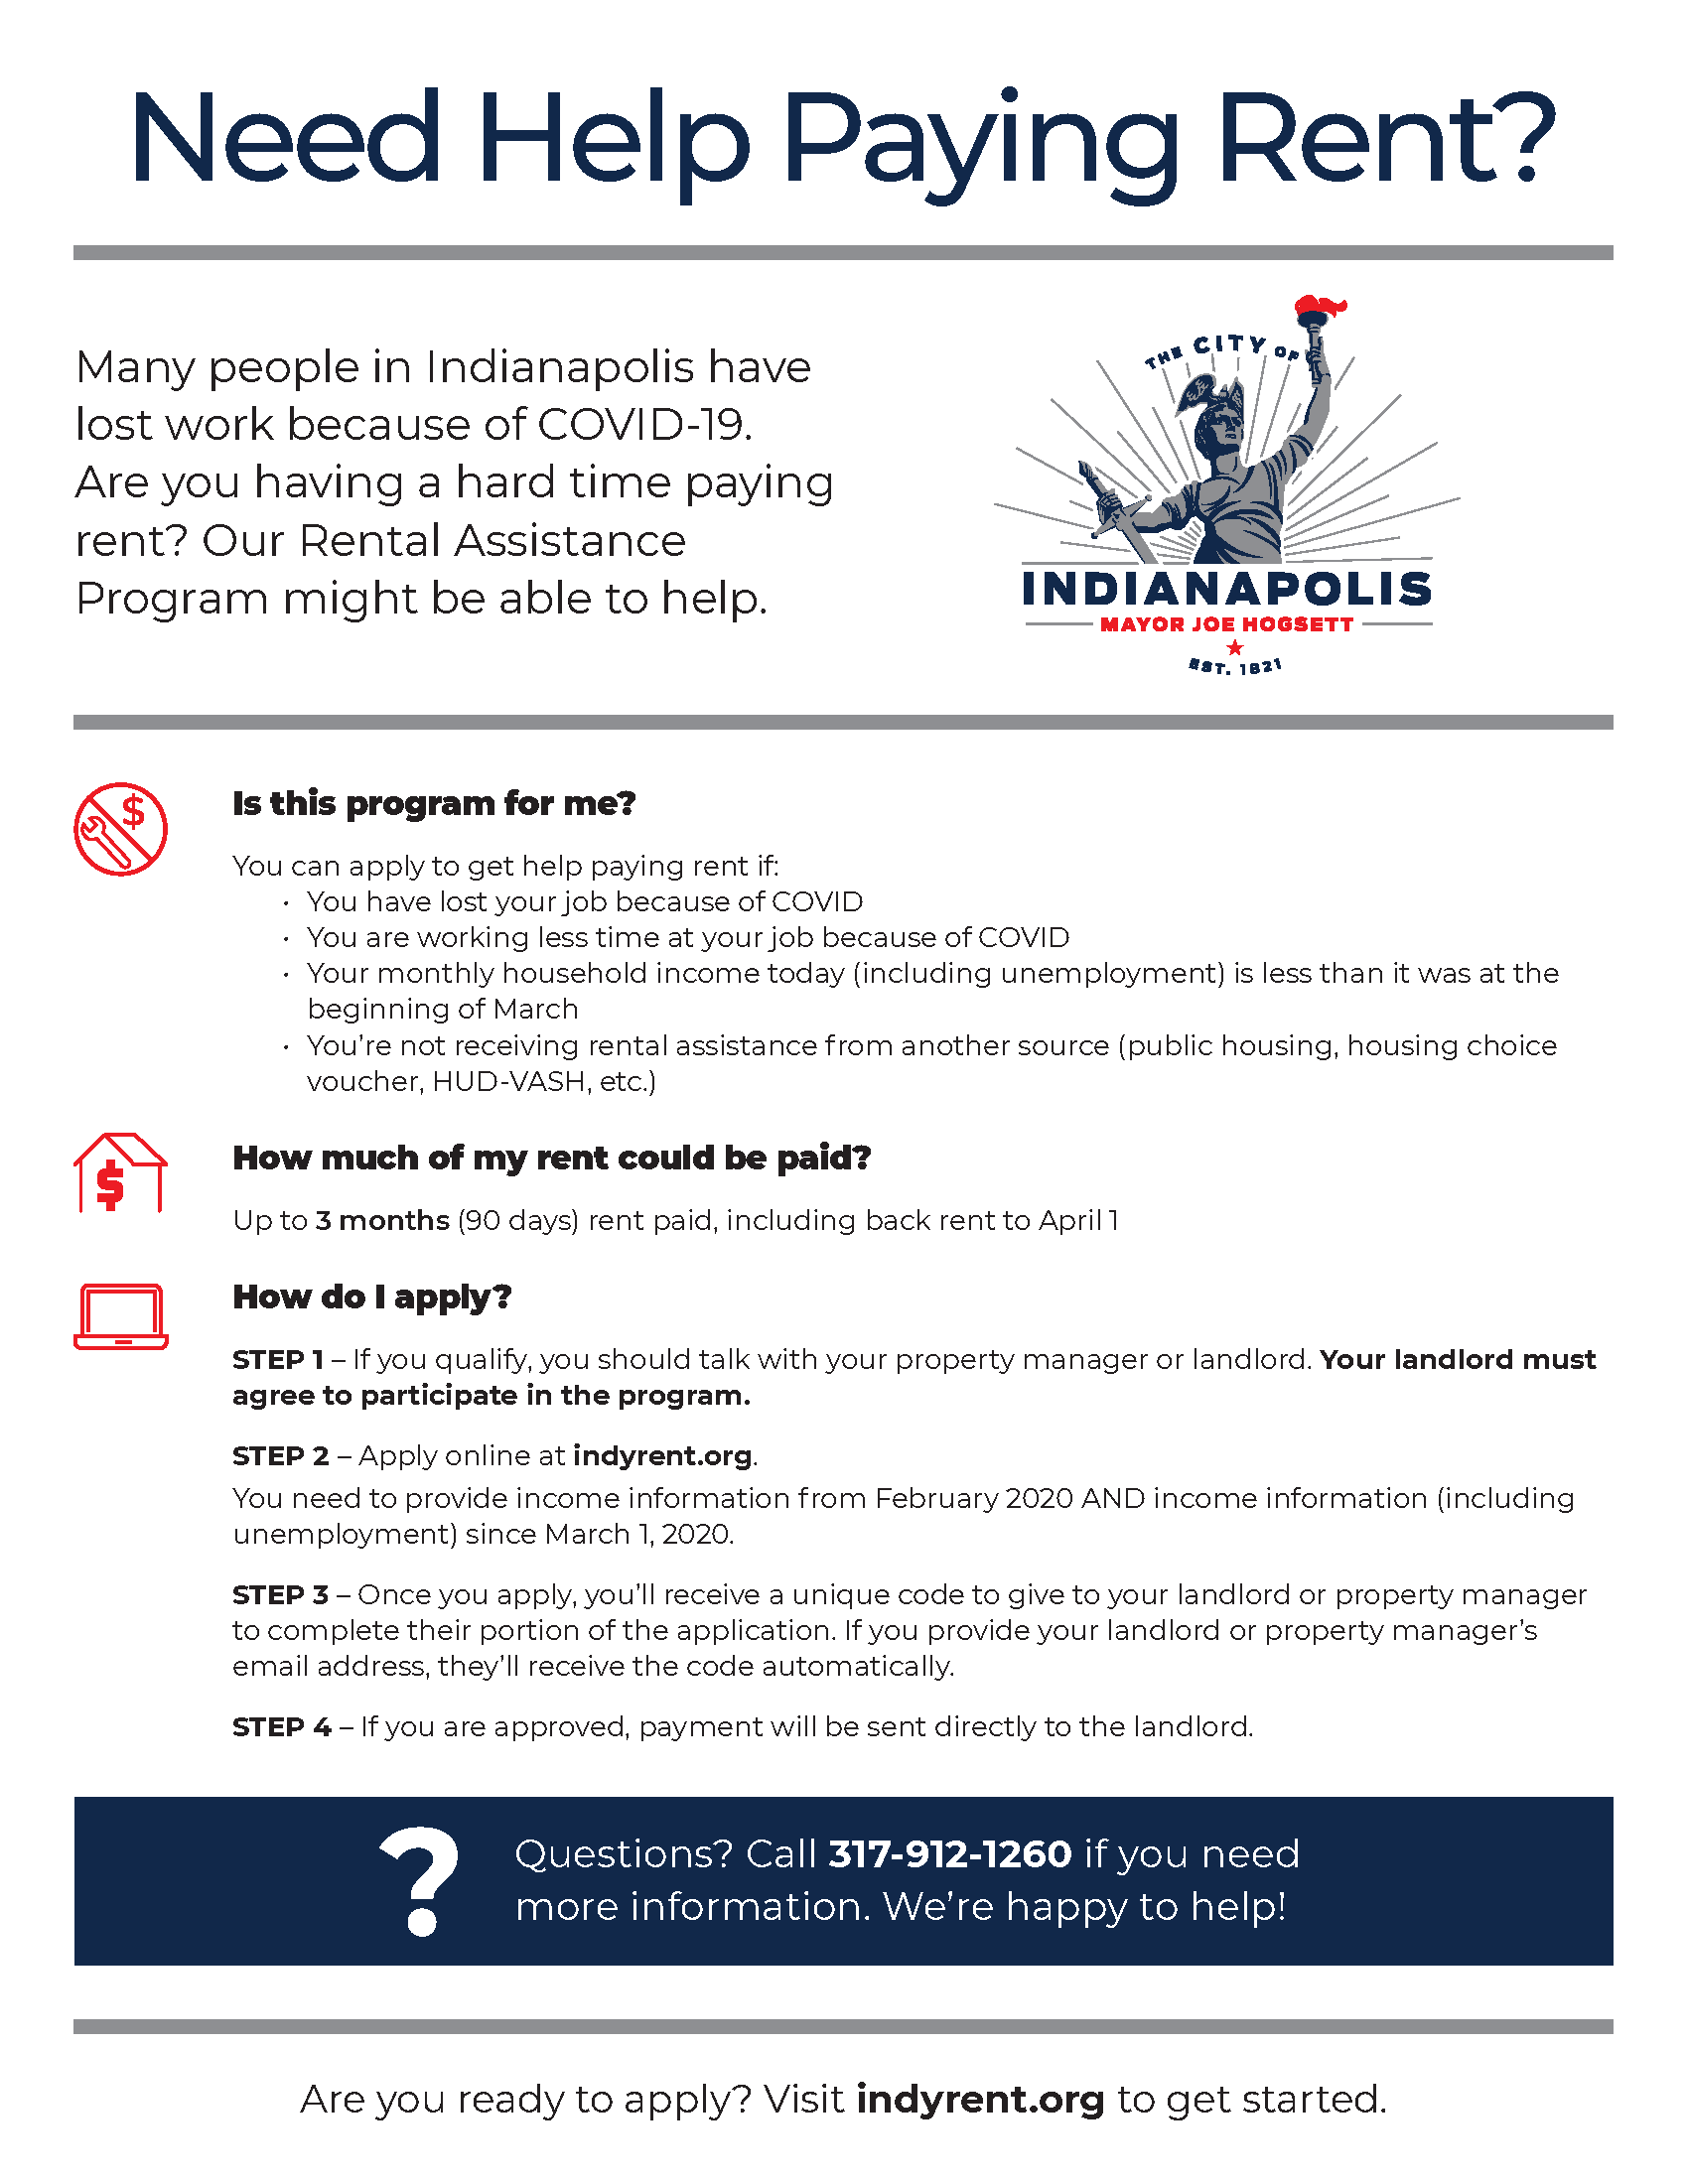 20200708 Rental Assistance Program Flyer P1 7.9.20 Page 1